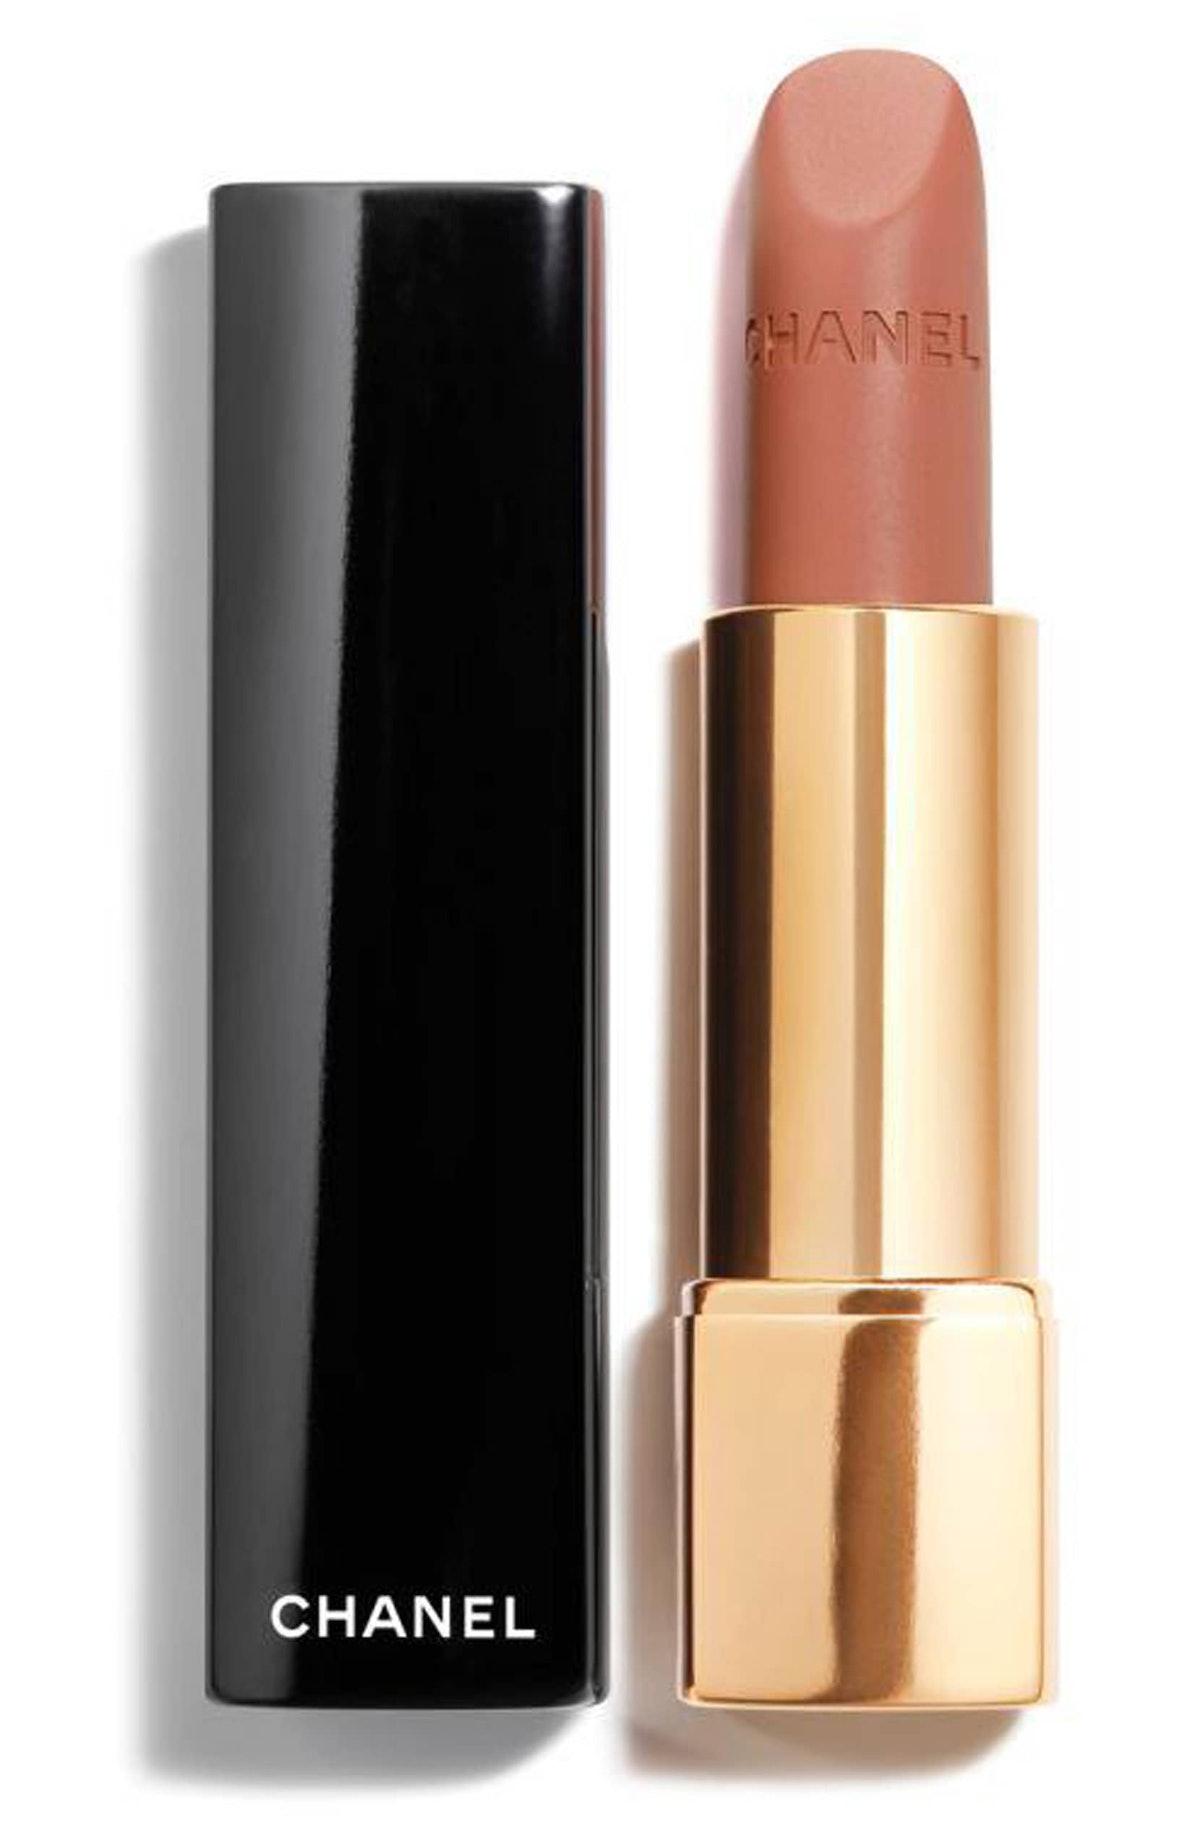 Rouge Allure Velvet Luminous Matte Lip Colour In 71 Nuance